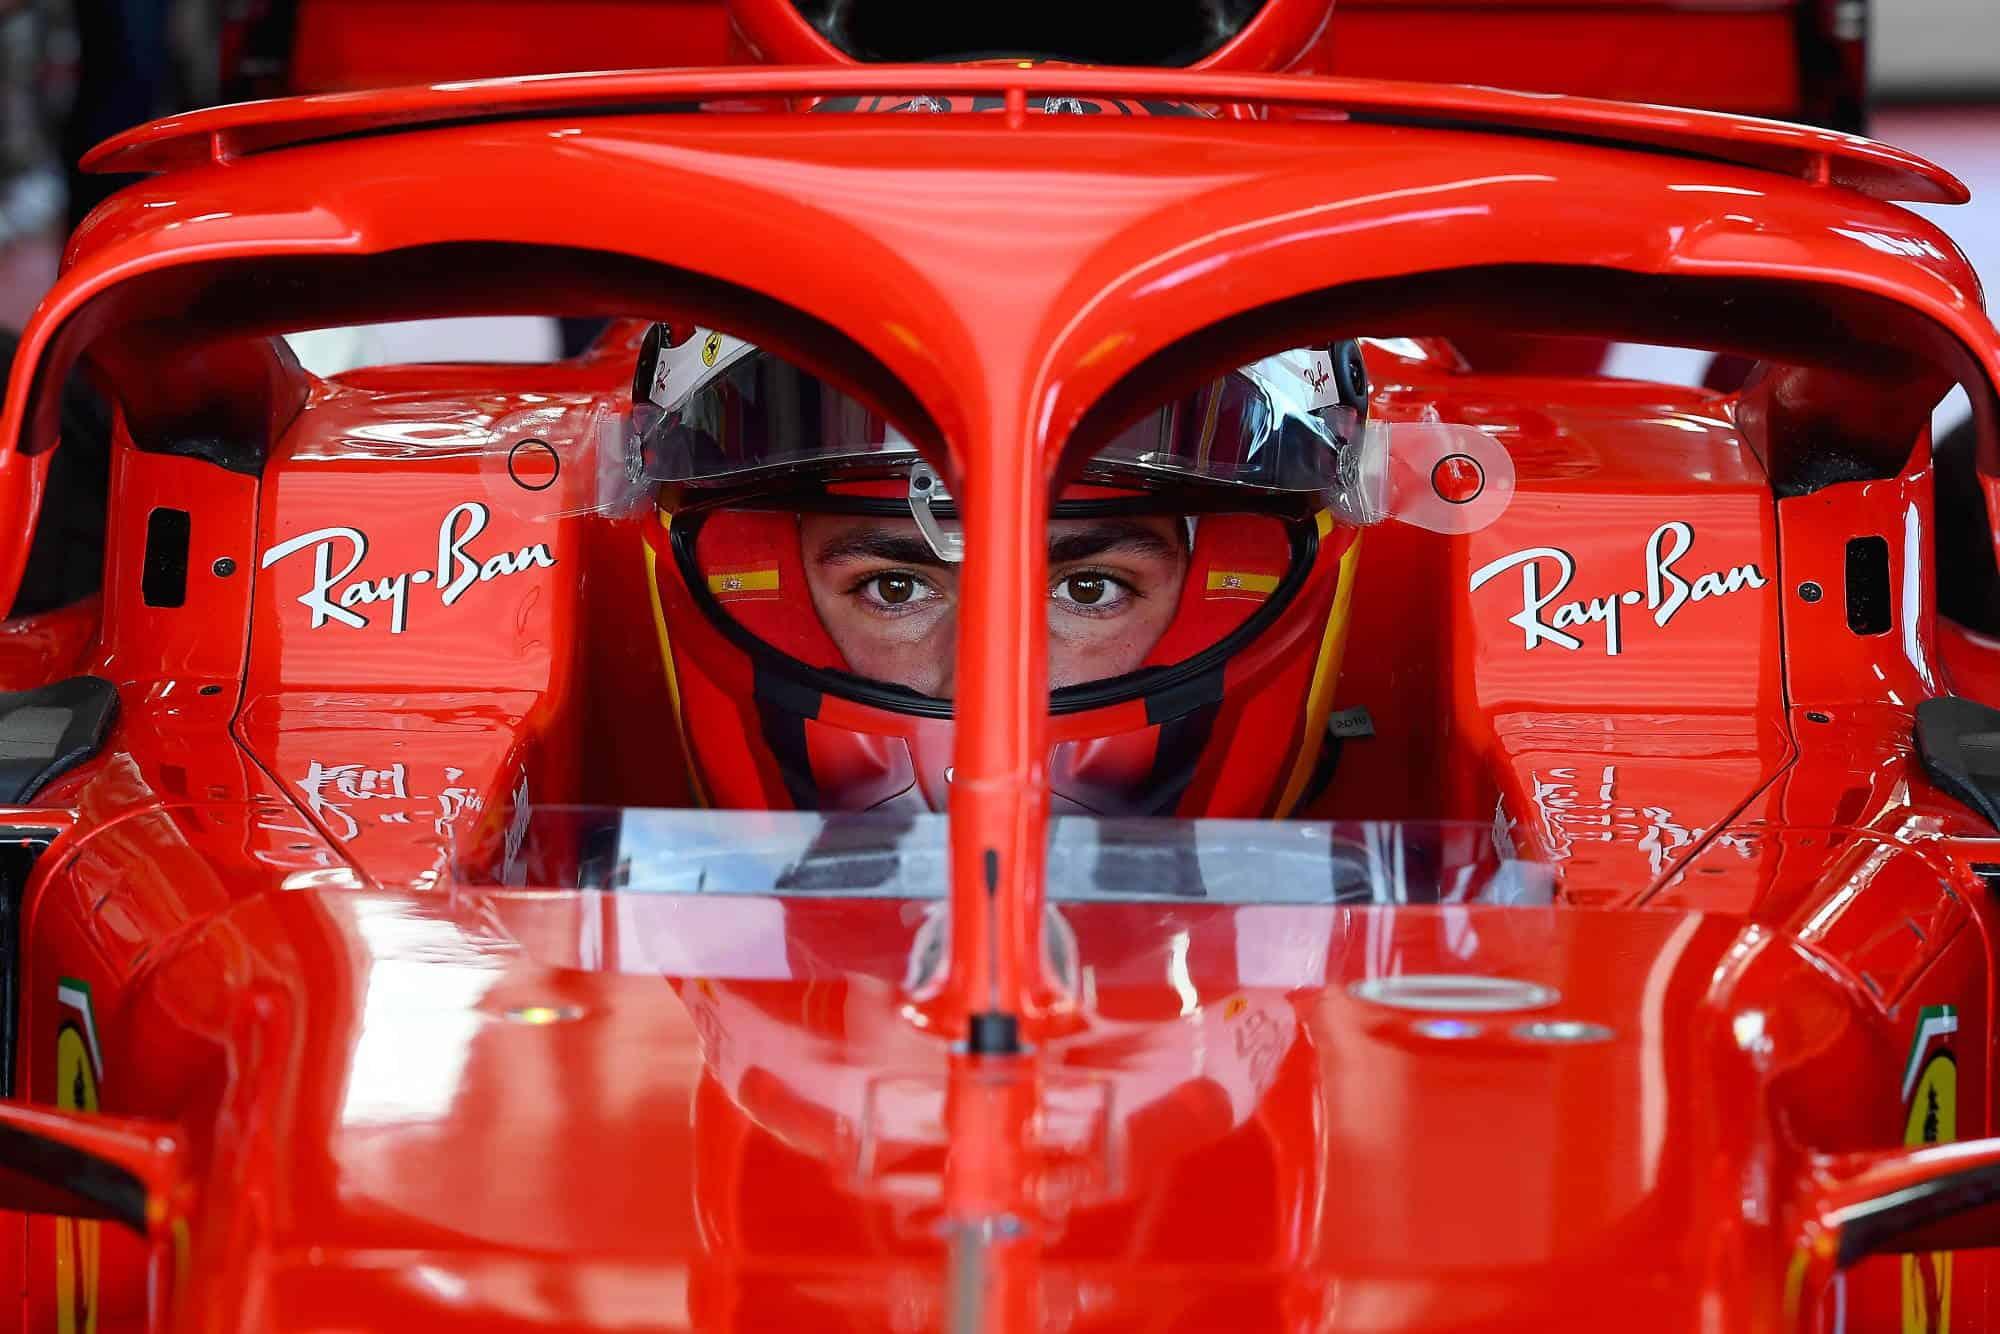 2021 Fiorano Carlos Sainz first Ferrari test in the car with helmet on Fiorano Ferrari SF71H 2018 on Wed 27 Jan 2021 Photo Ferrari